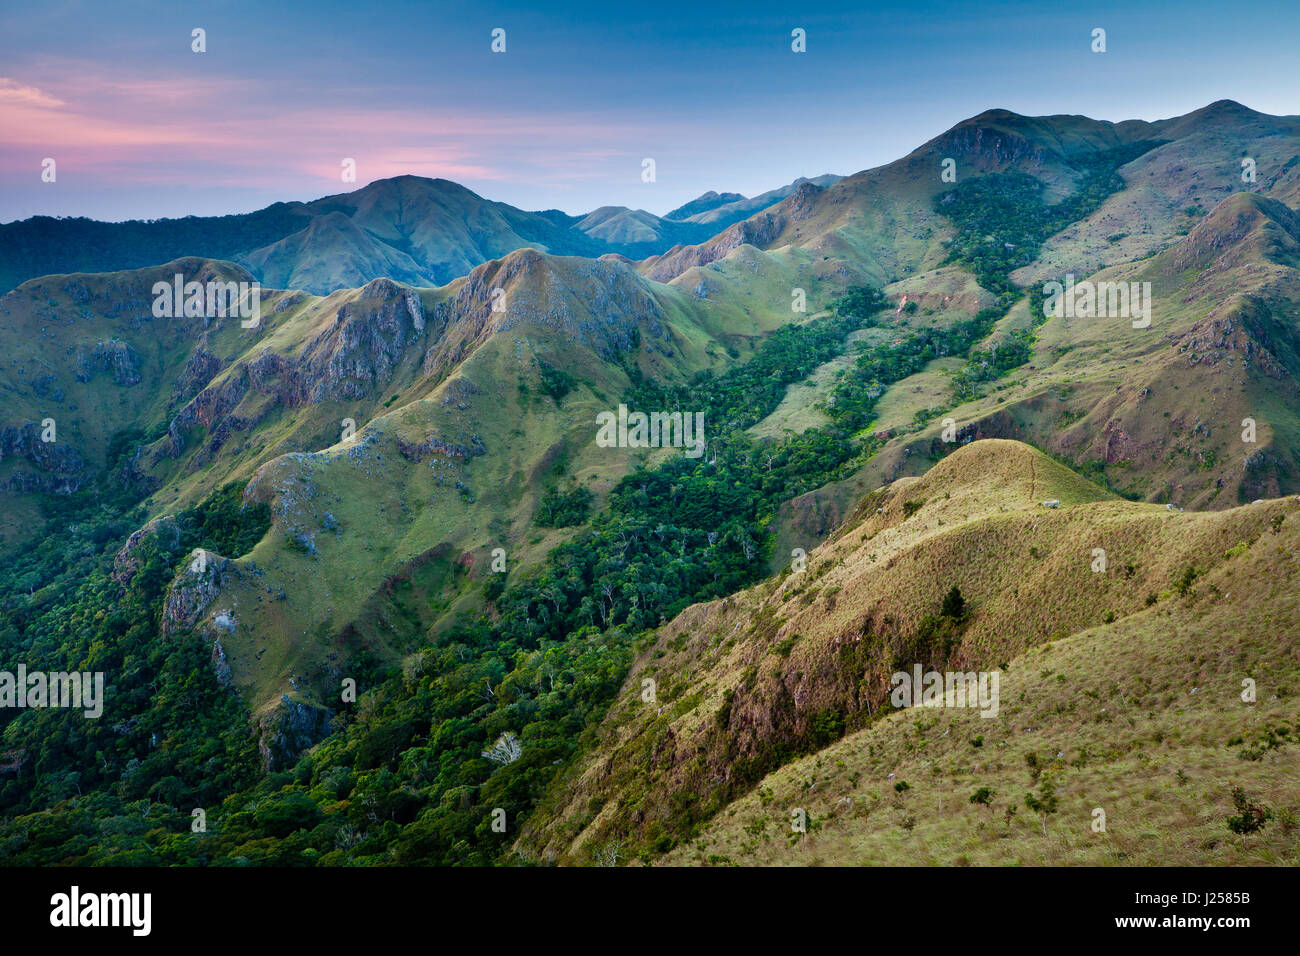 Dawn in Altos de Campana national park, Republic of  Panama. - Stock-Bilder